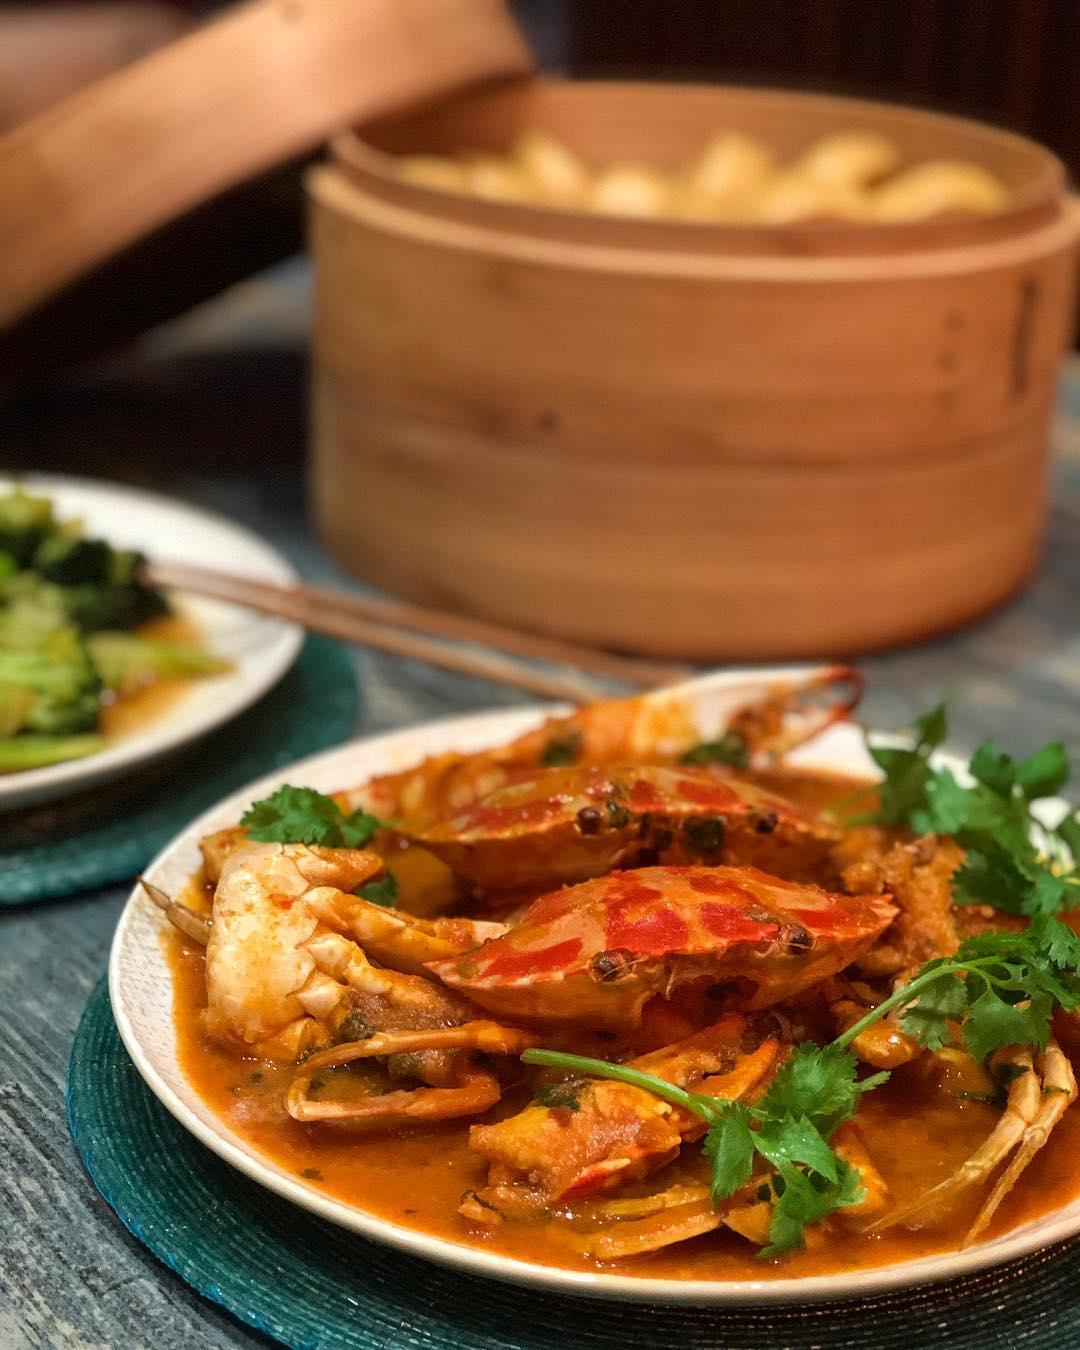 makanan khas Singapura: Chili Crab